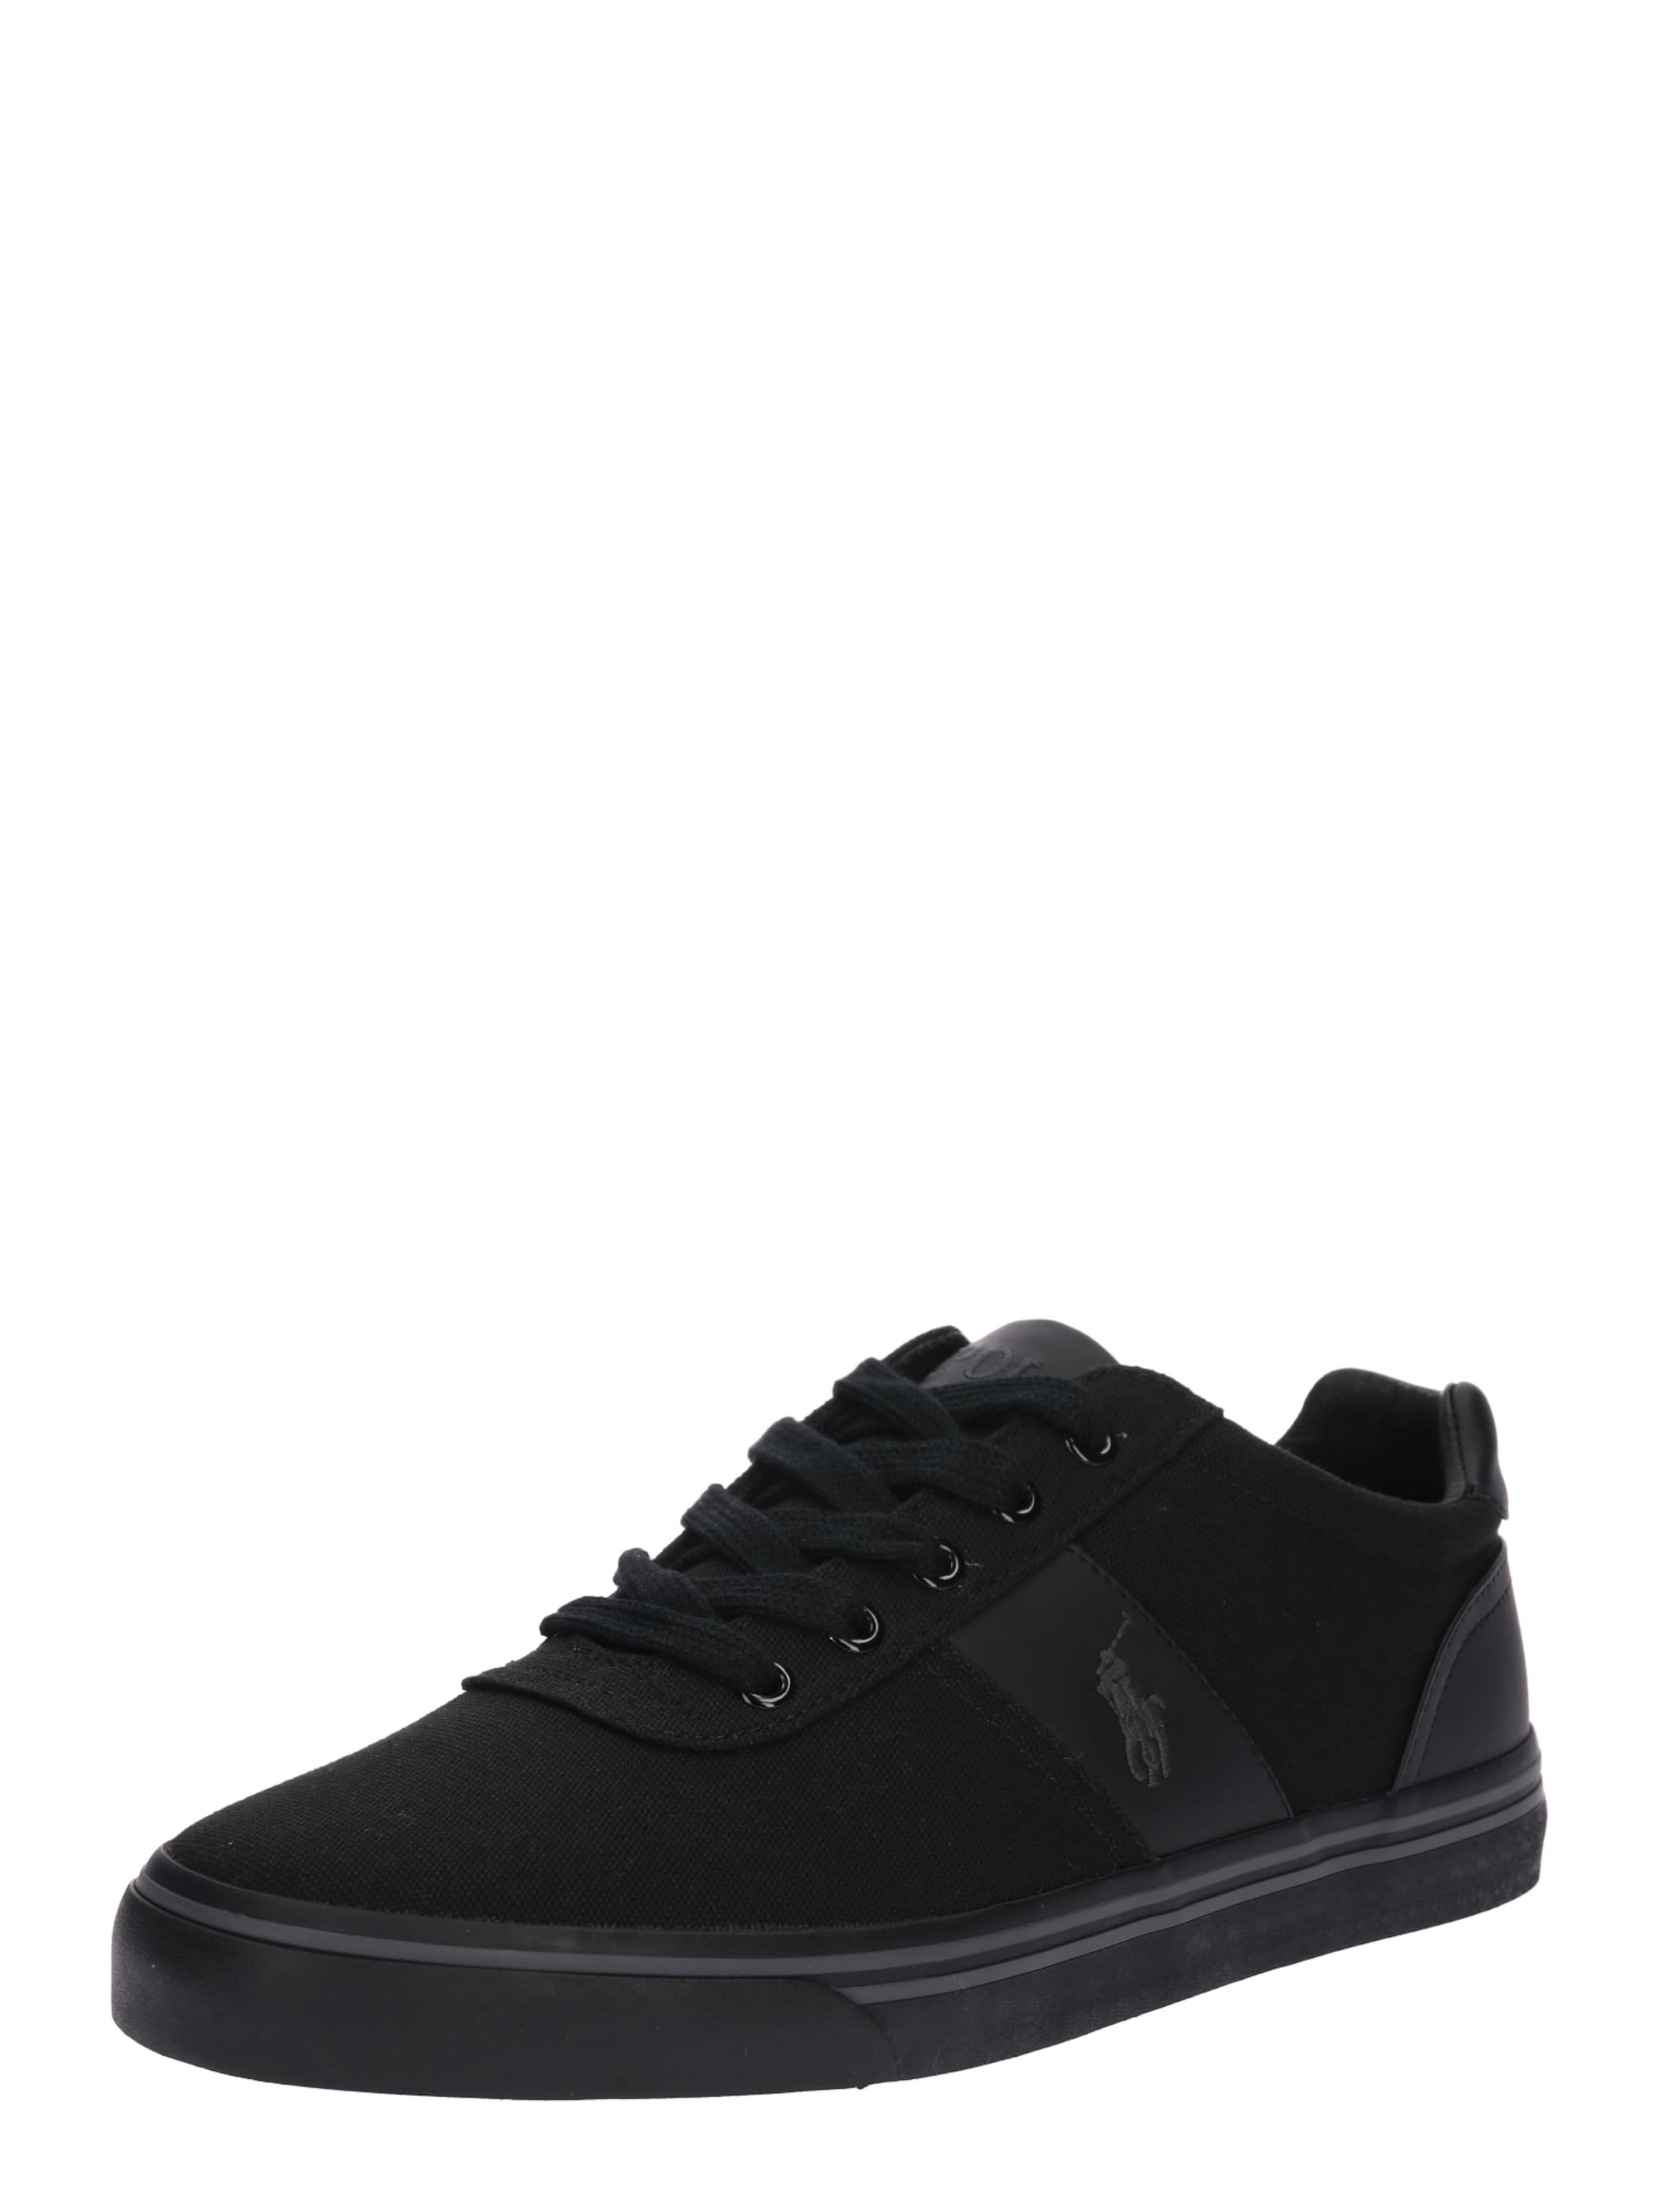 Dunkelgrau Sneaker Polo 'hanford' Lauren Ralph In qzpUMVGS